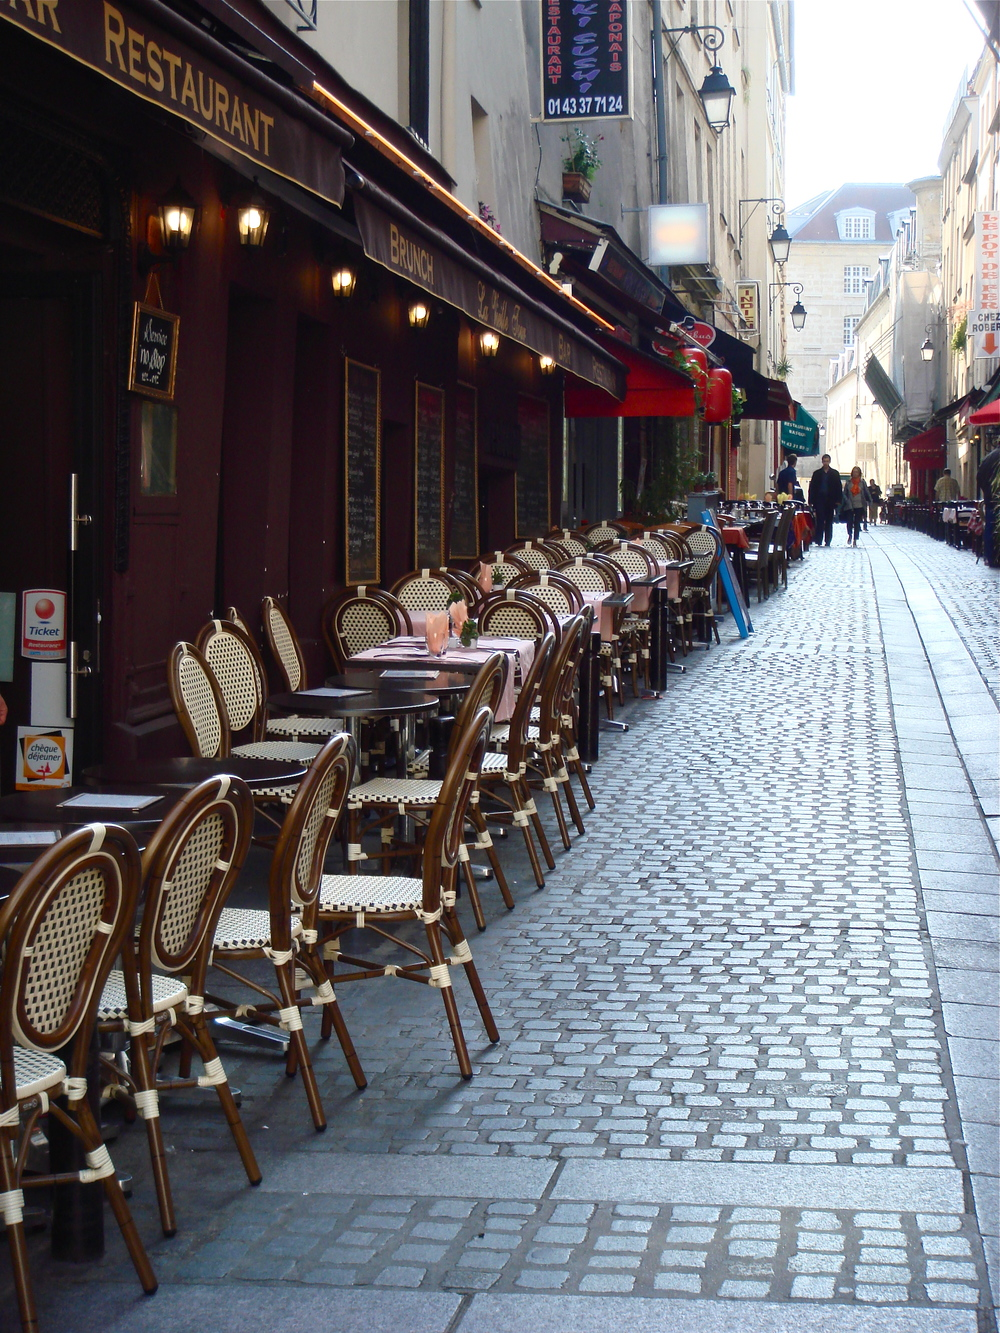 Cafe in Paris, France